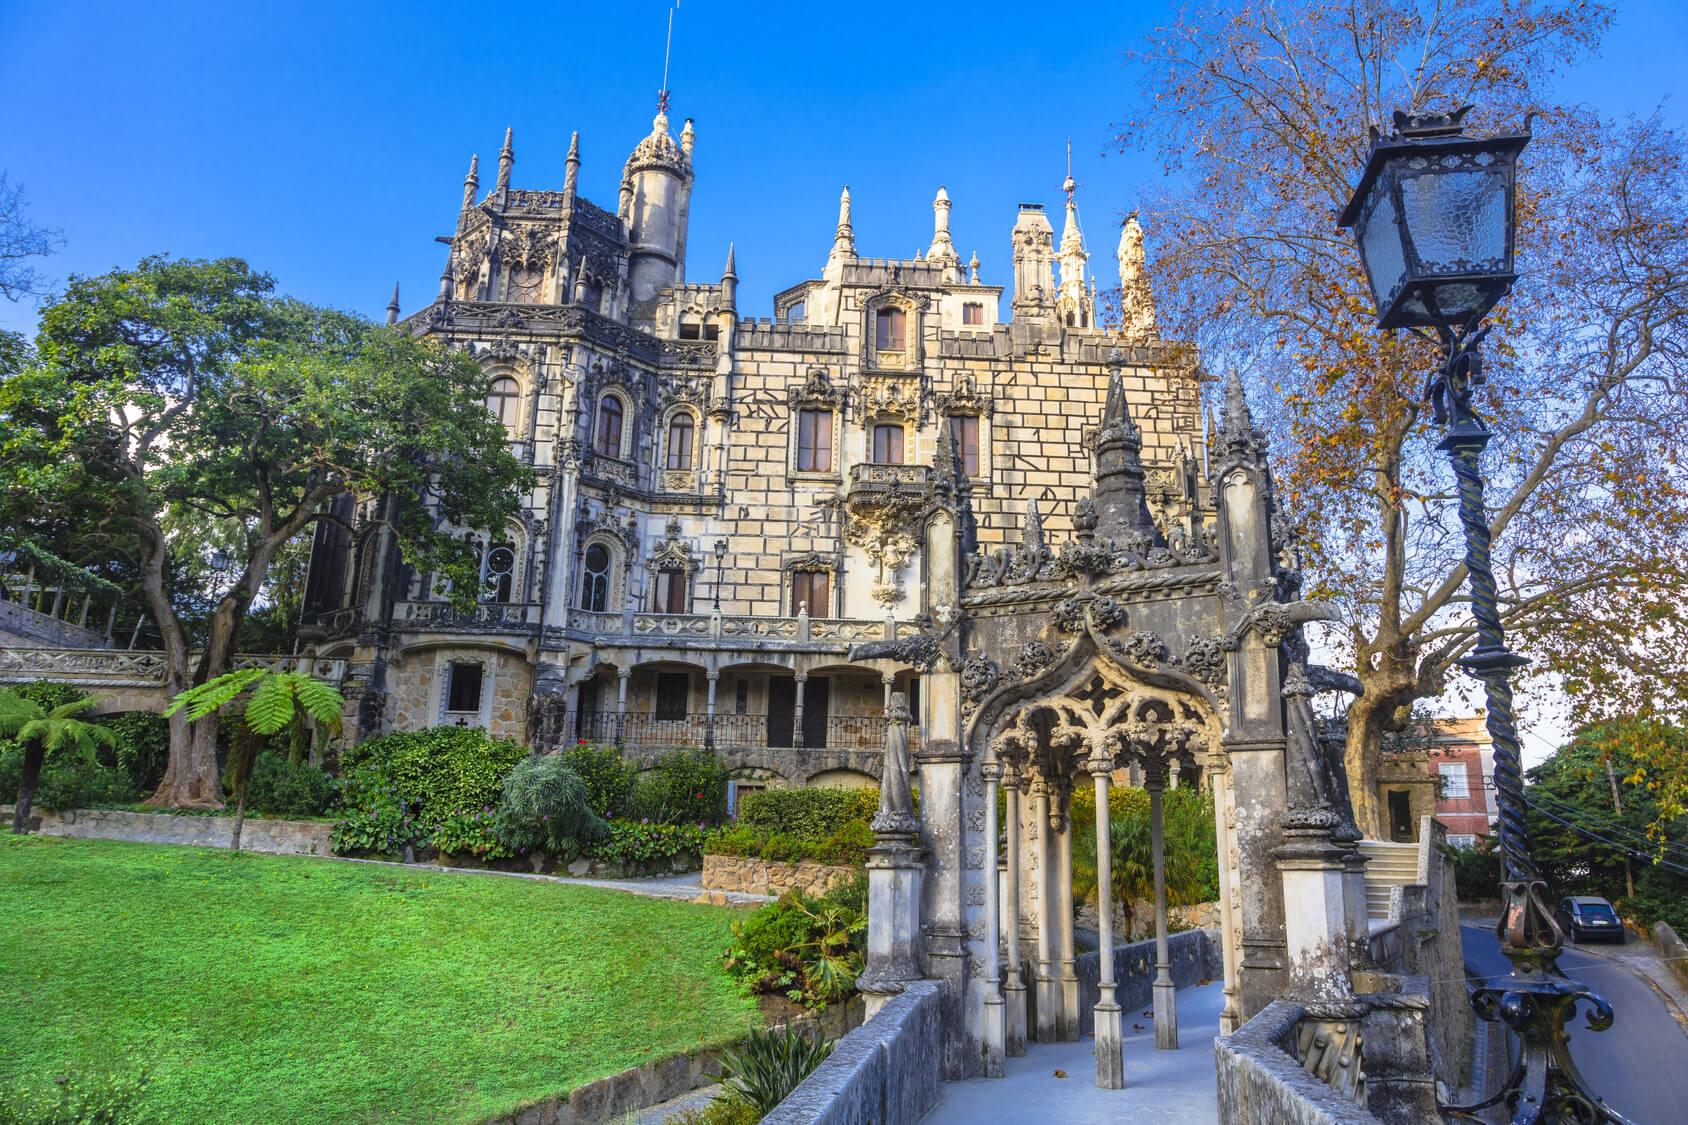 Sintra Palaces